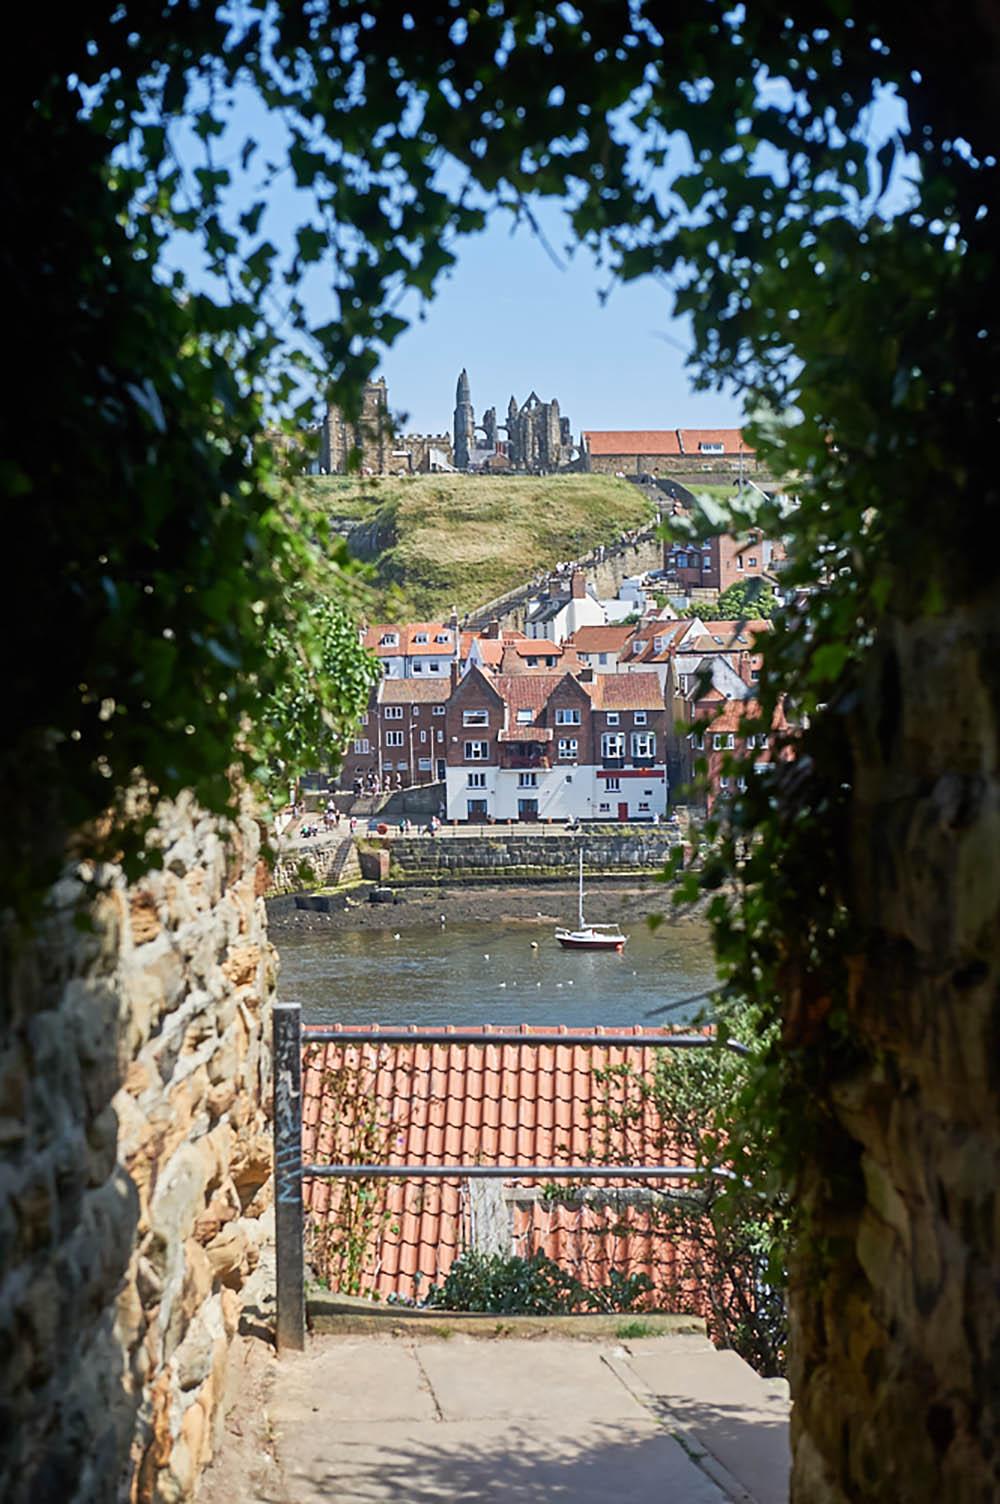 whitby, yorkshire, england, uk, fishing, town, stadt, urlaub, holiday, travel, reise, summer, abbey